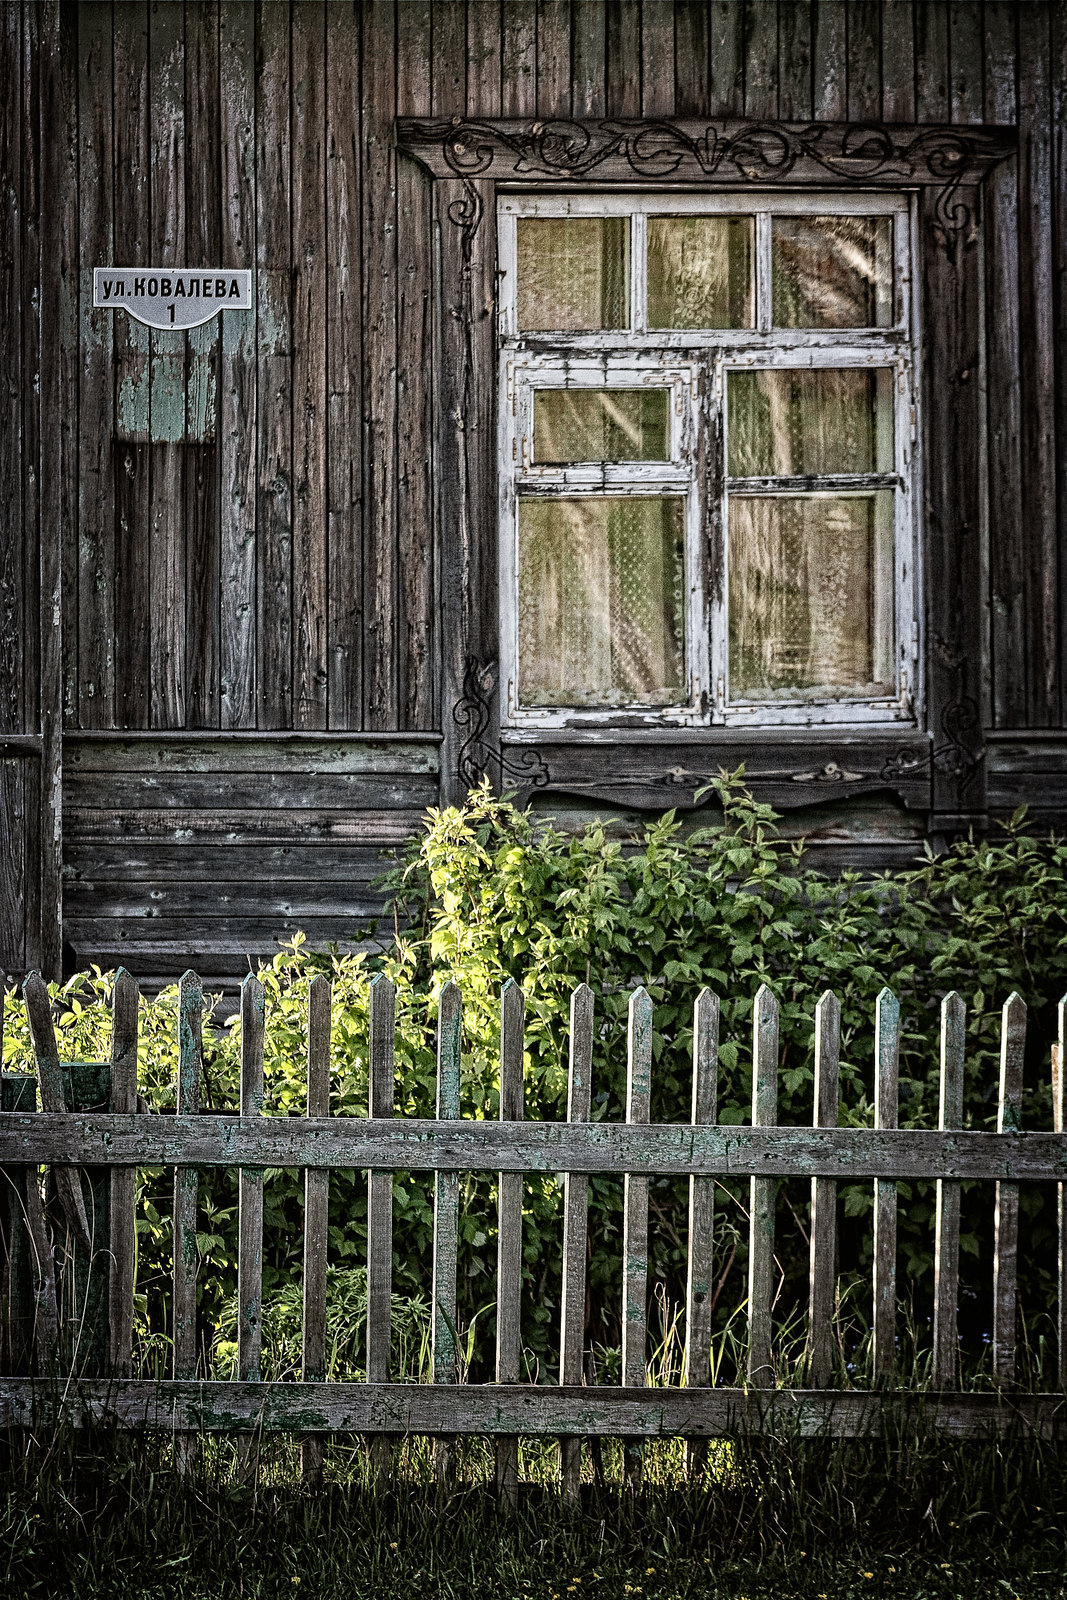 Vindu / Window